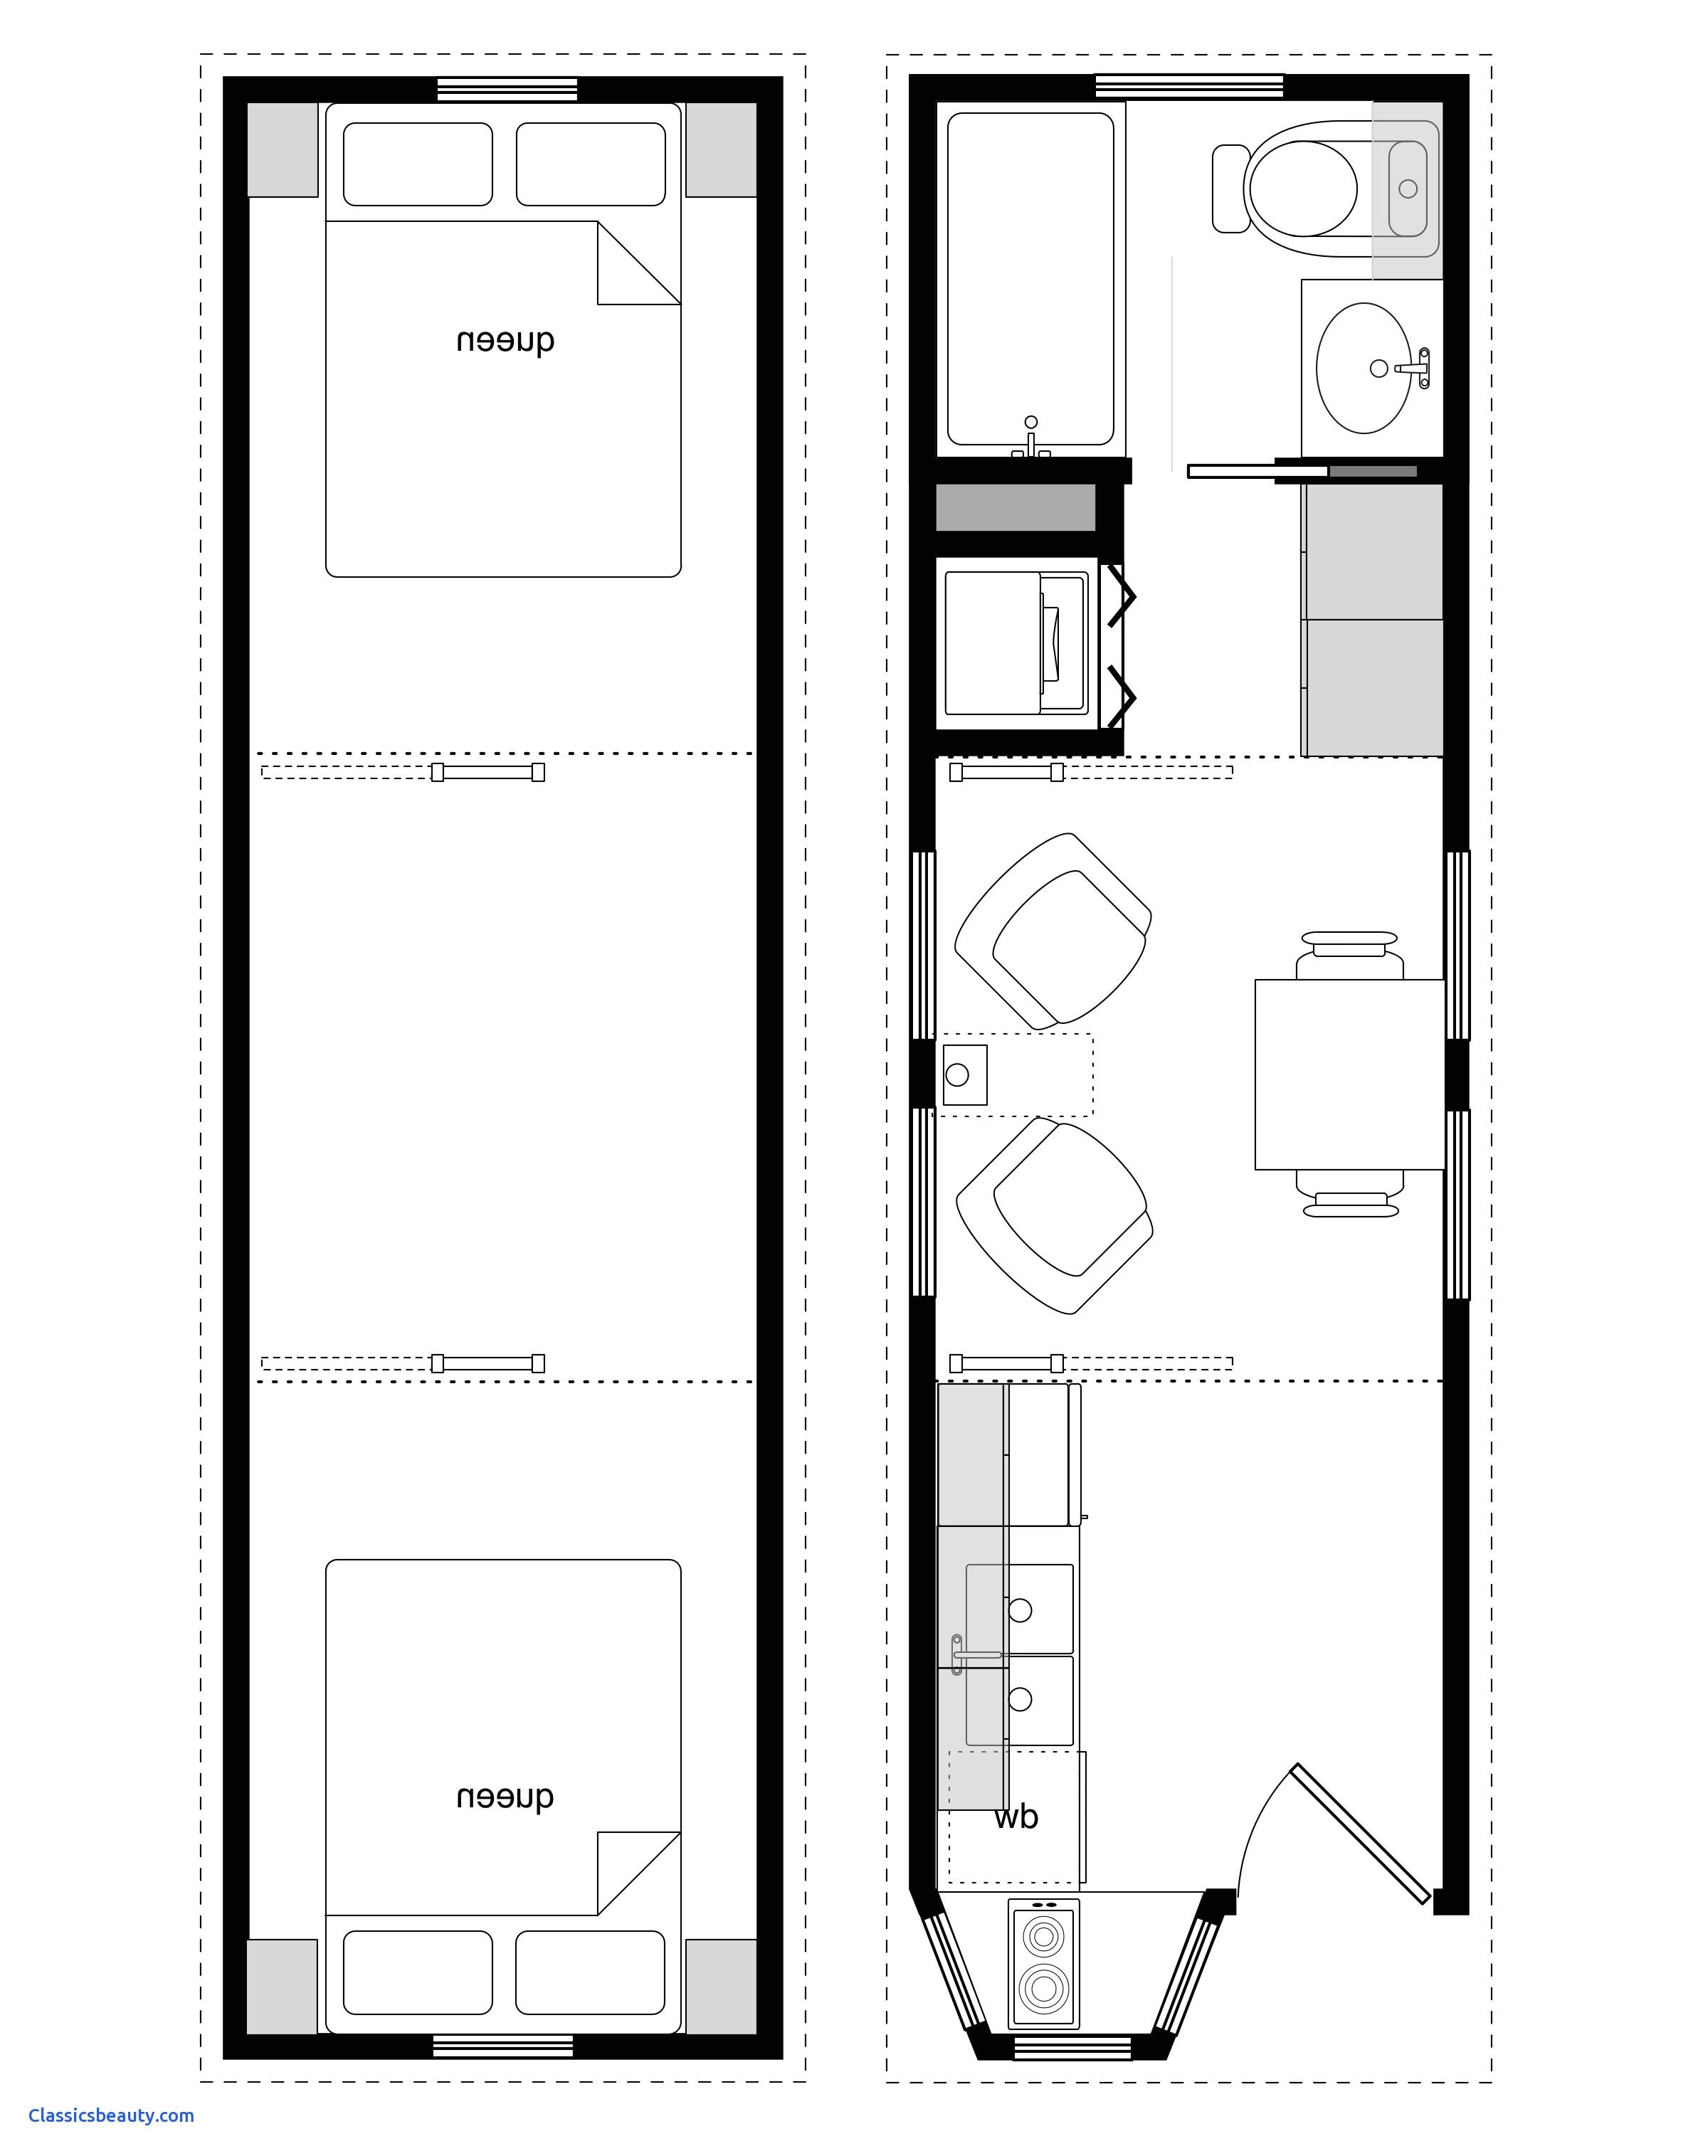 sample floor plan for small house